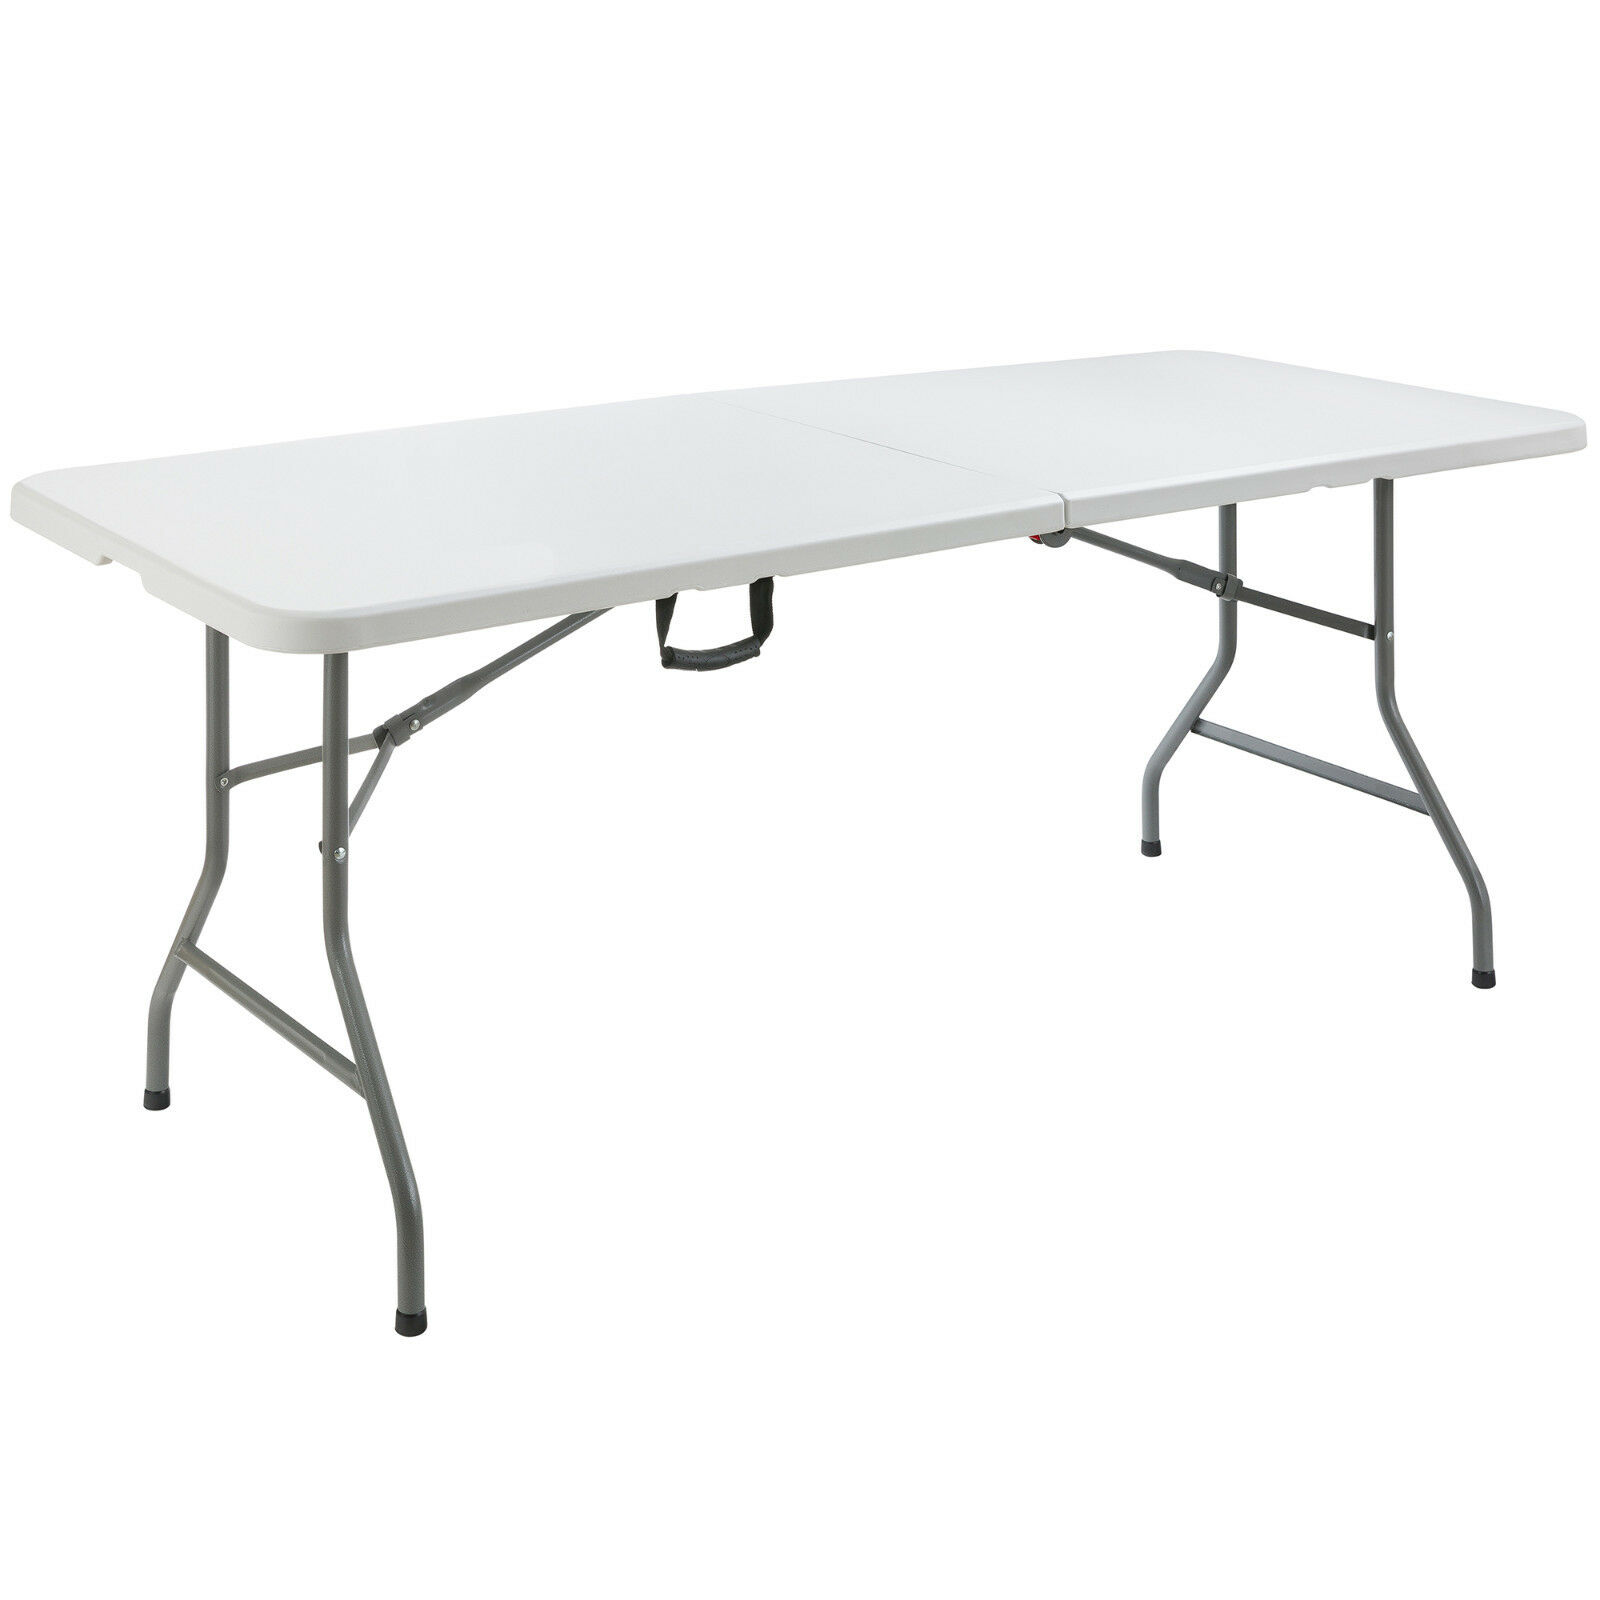 Gartentisch Metall Rechteckig Test Vergleich Gartentisch Metall